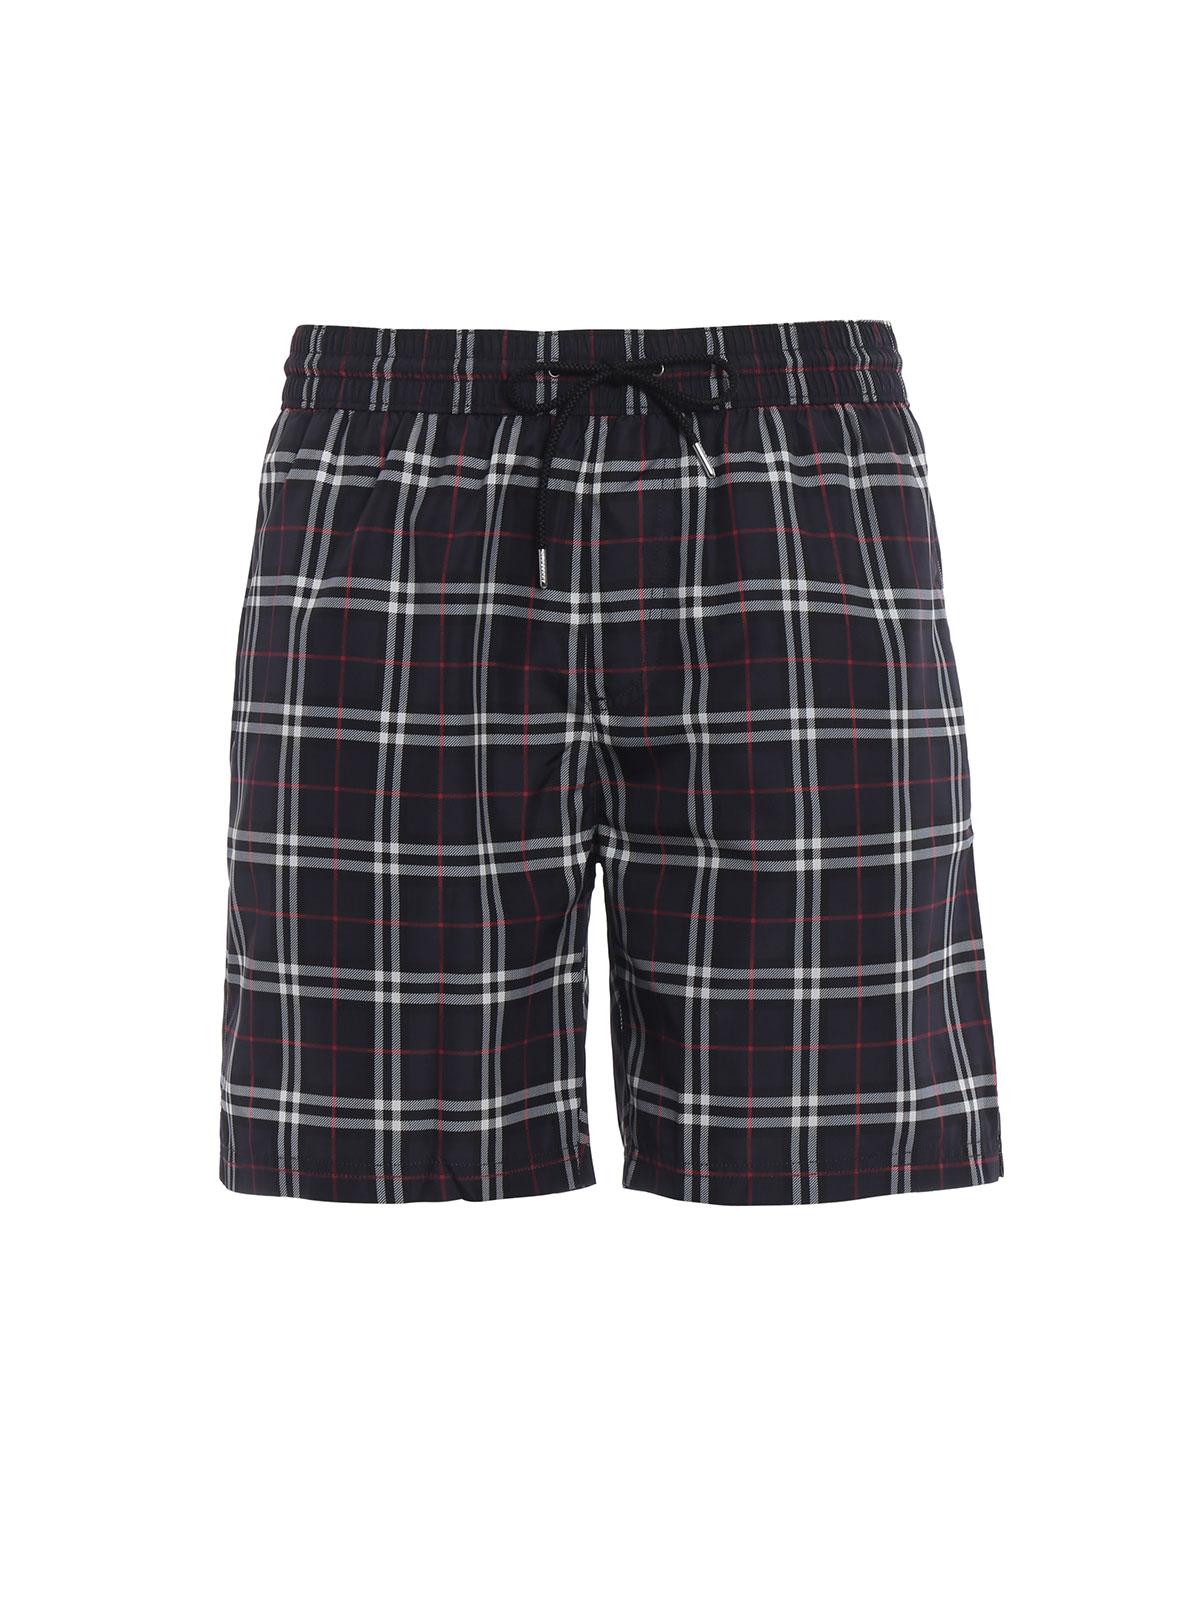 ffb4c0bf02 BURBERRY: Swim shorts & swimming trunks - Guildes navy Check swim shorts